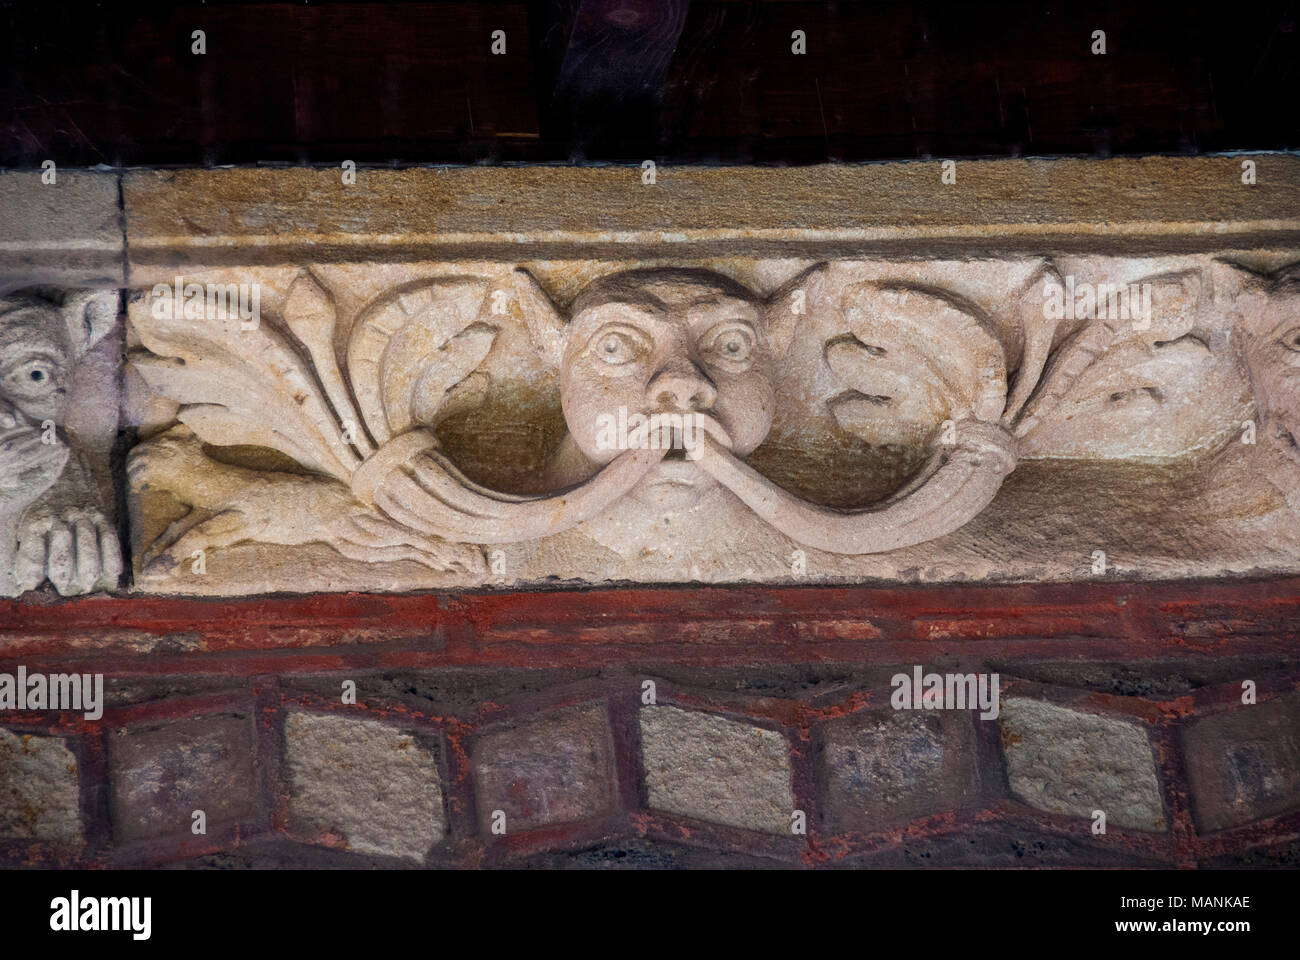 Sculptures. Cloister of cathedral Notre Dame, Le Puy en Velay,  Haute Loire, Auvergne, France, Europe Stock Photo